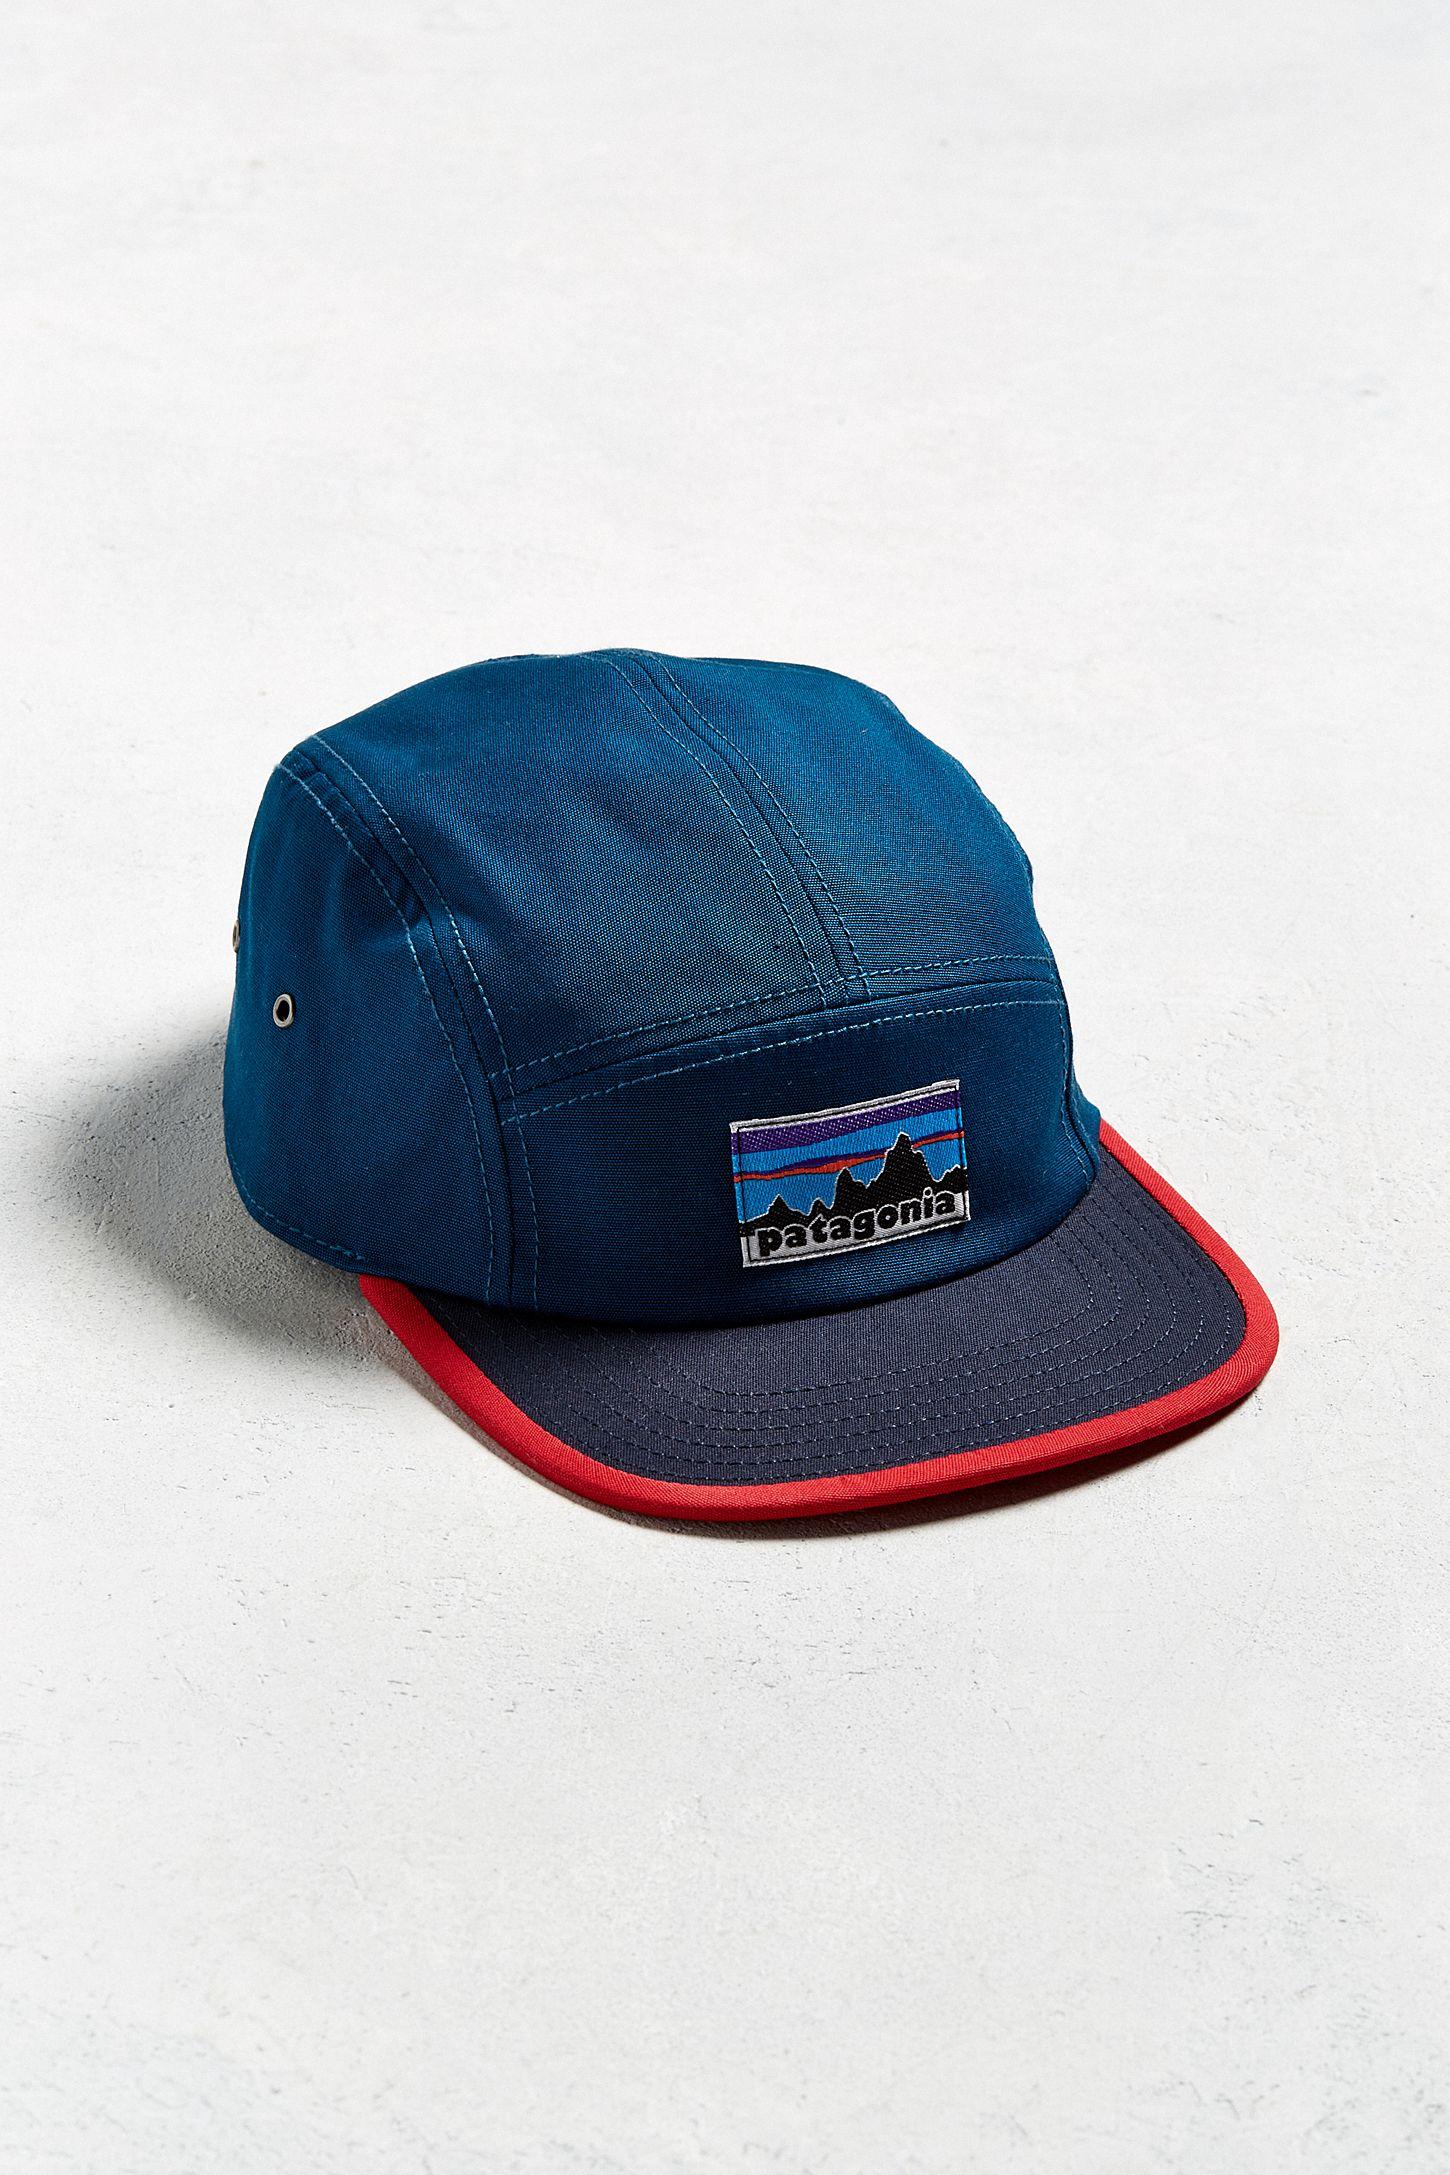 Patagonia Fitz Roy Label 5-Panel Hat  af766b1f20e